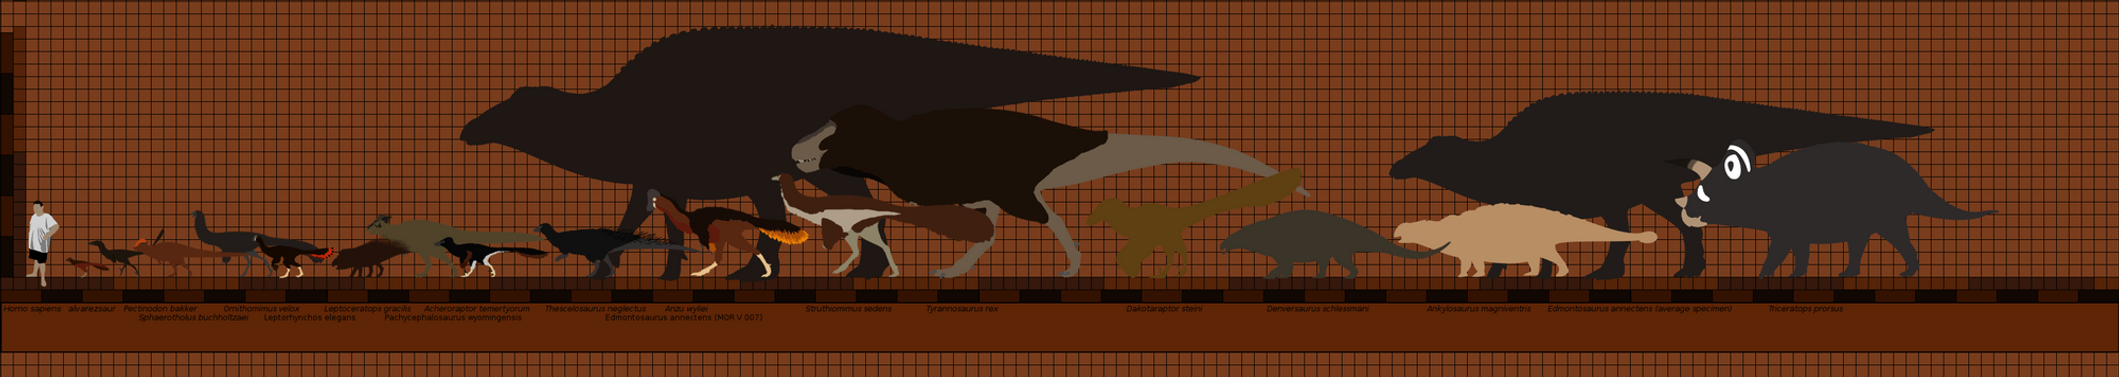 hell_creek_dinosaurs_by_paleop-d9pvmve.png